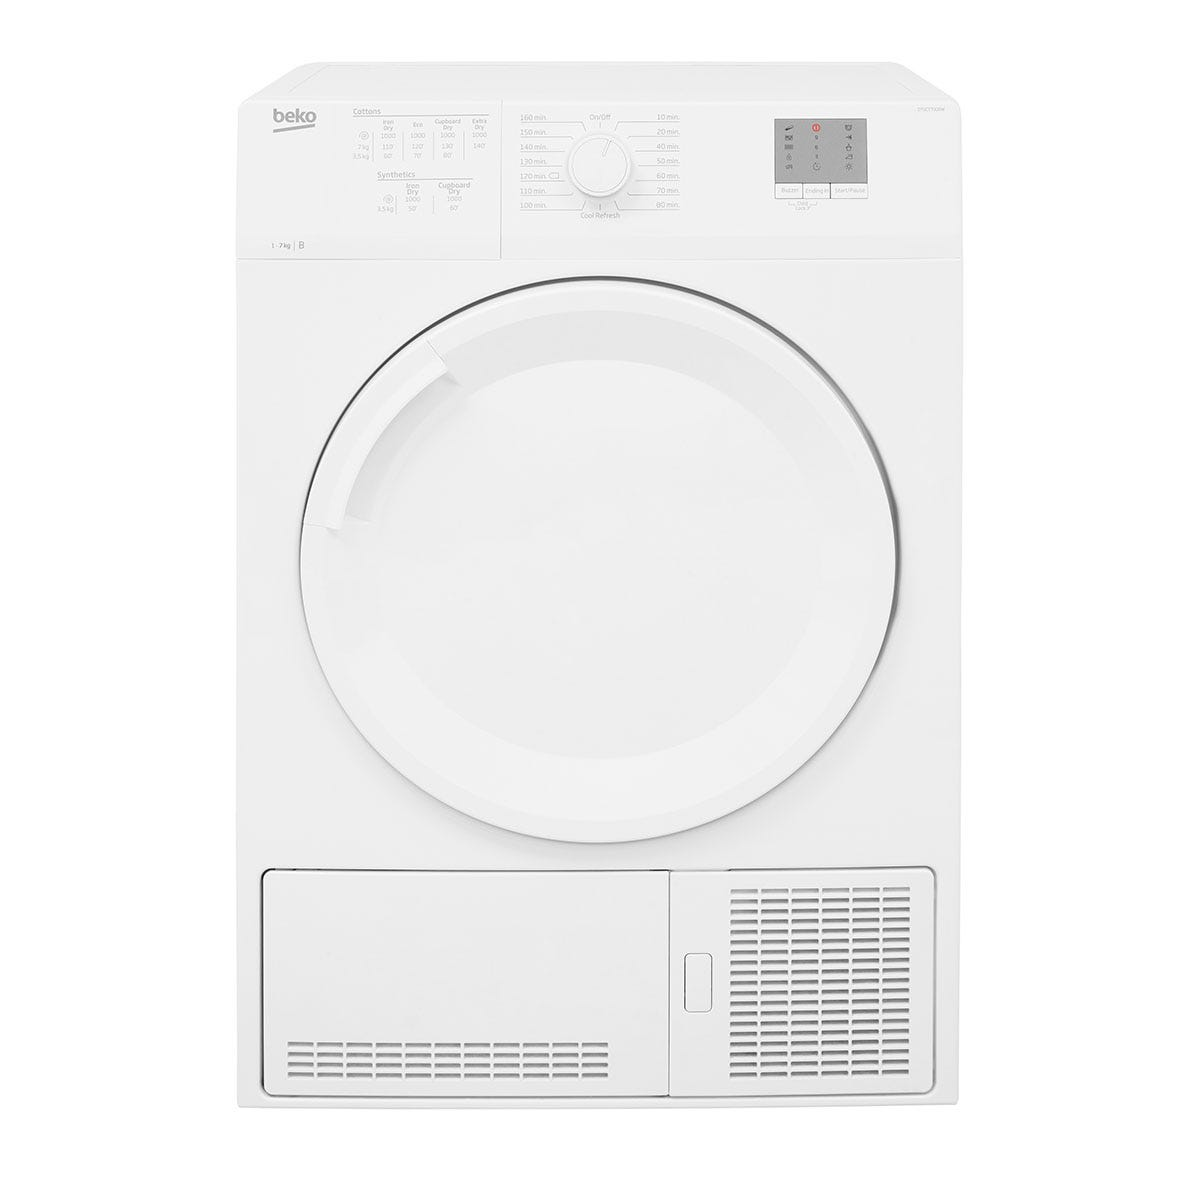 Beko DTGCT7000W Freestanding 7KG Condenser Tumble Dryer - White